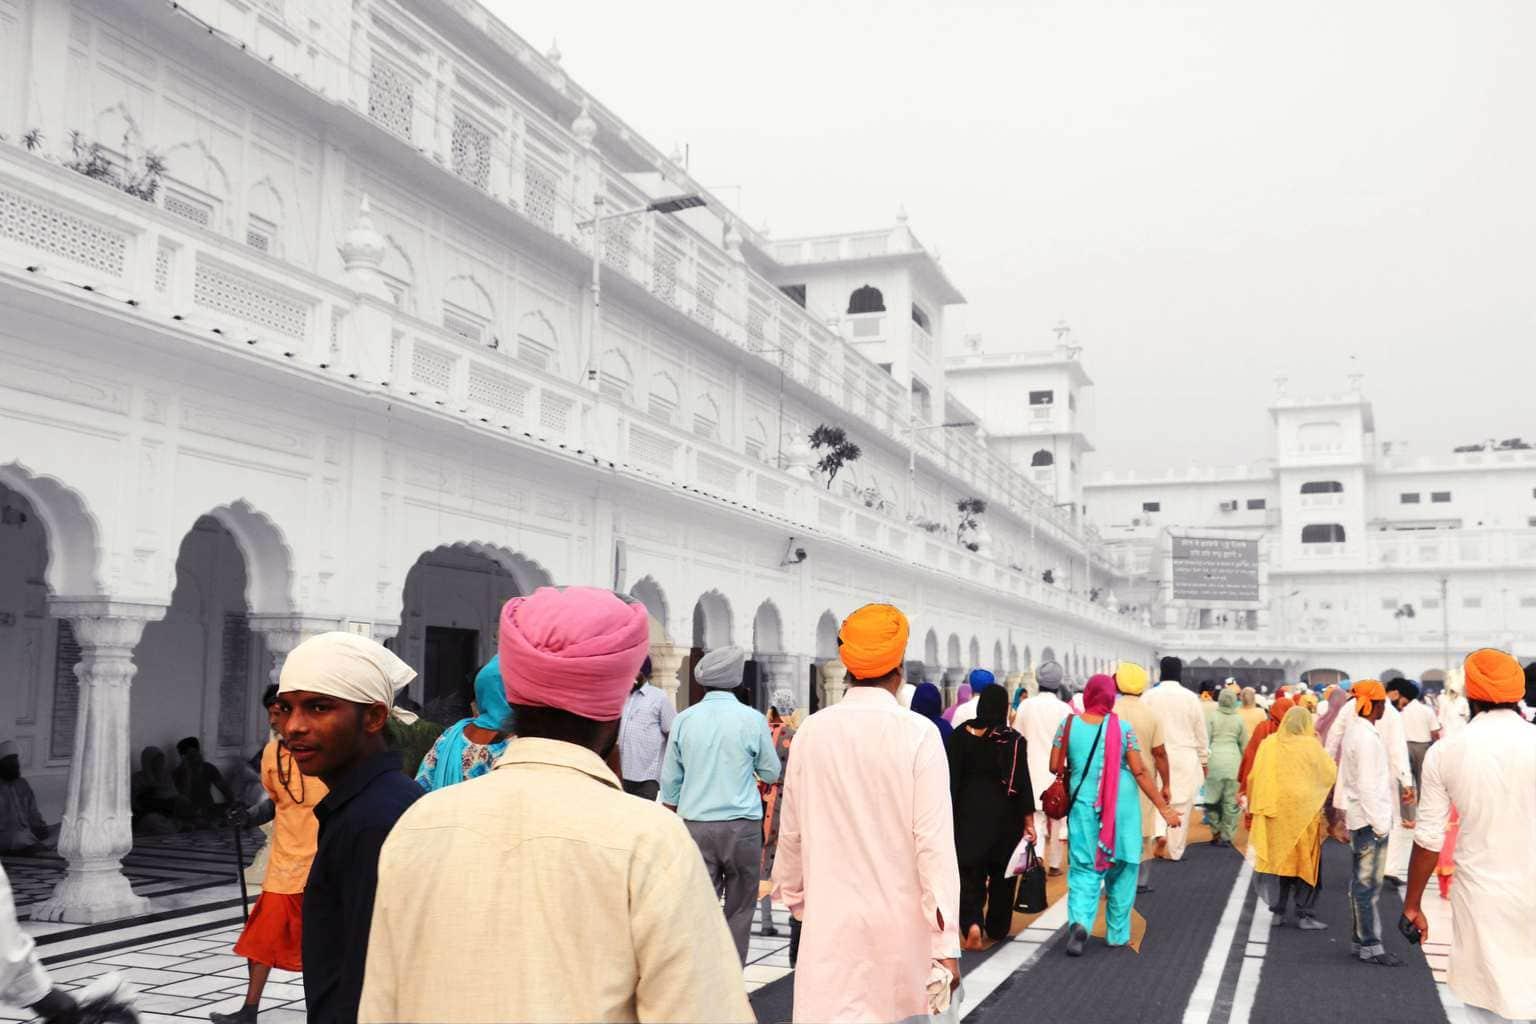 Devotees walking around The Golden Temple Amritsar